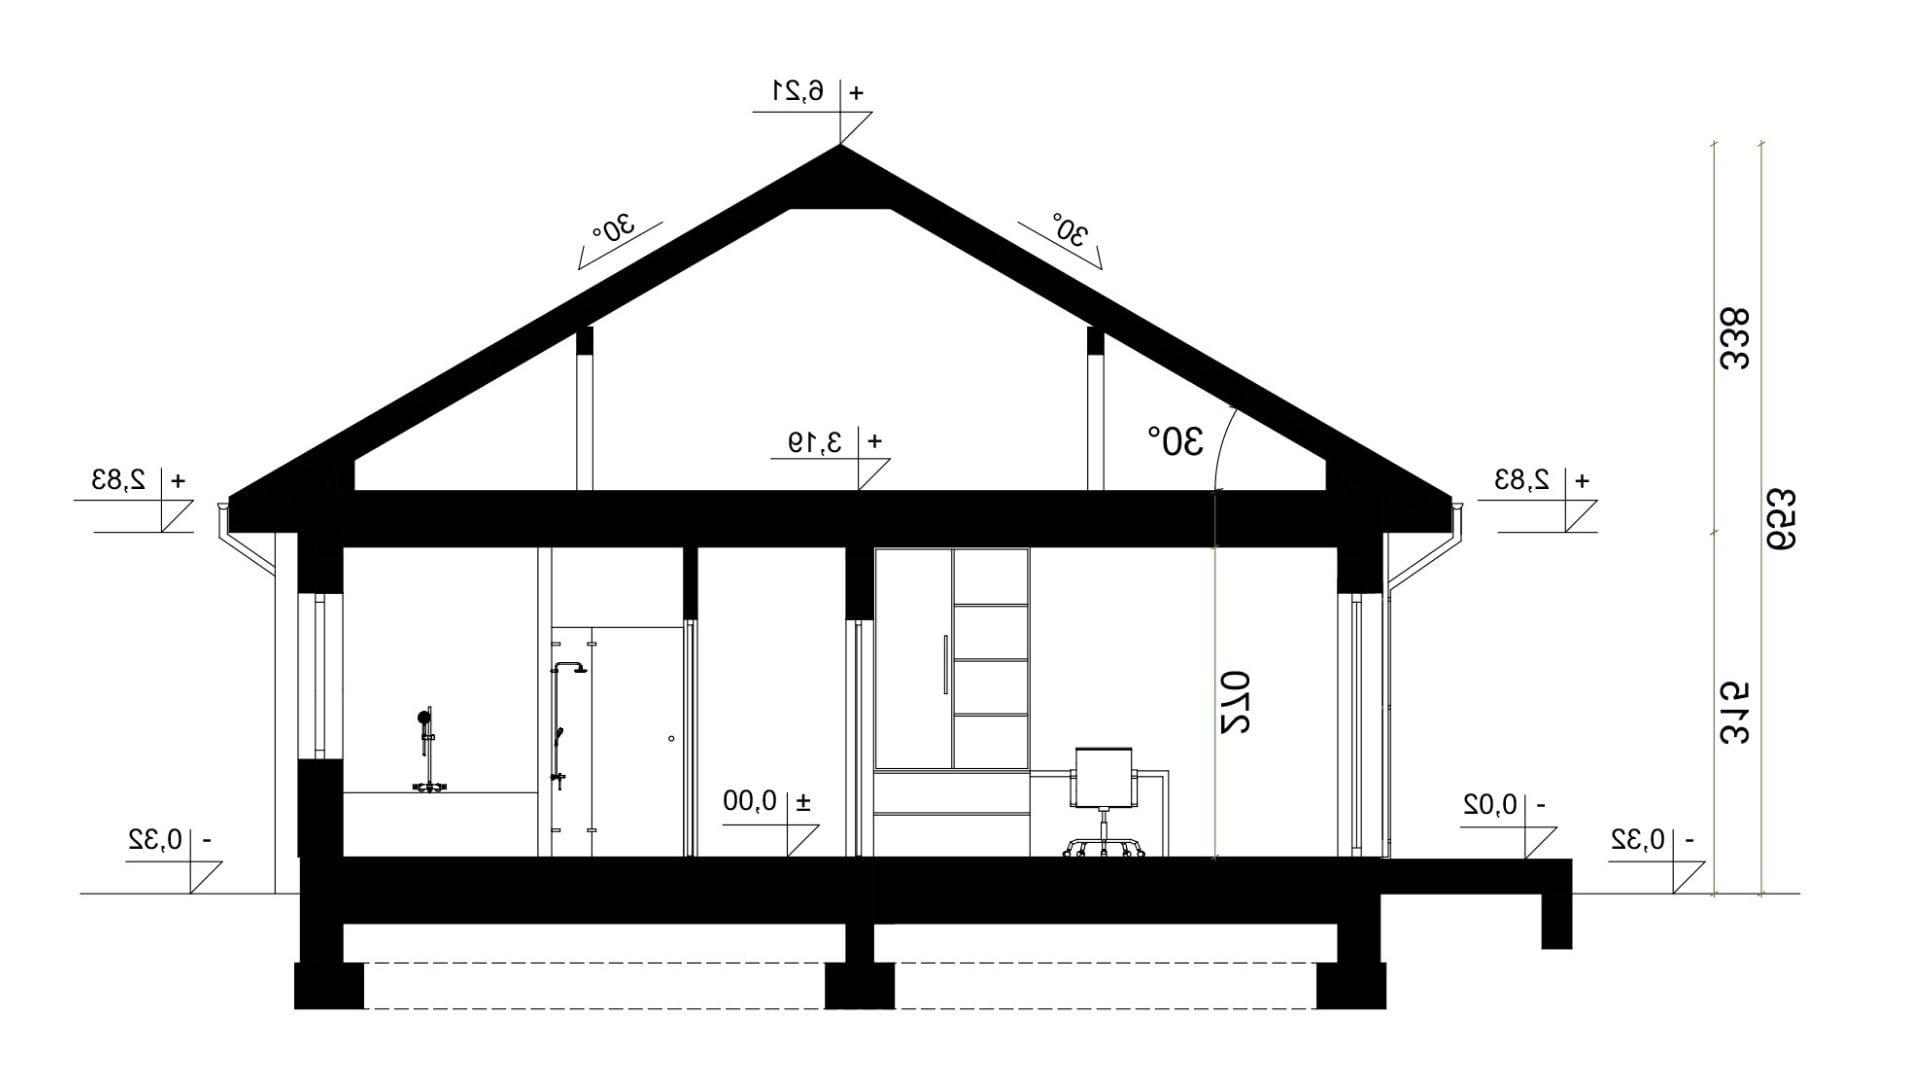 Przekrój A-A - projekt domu SEJ-PRO 051 ENERGO - odbicie lustrzane